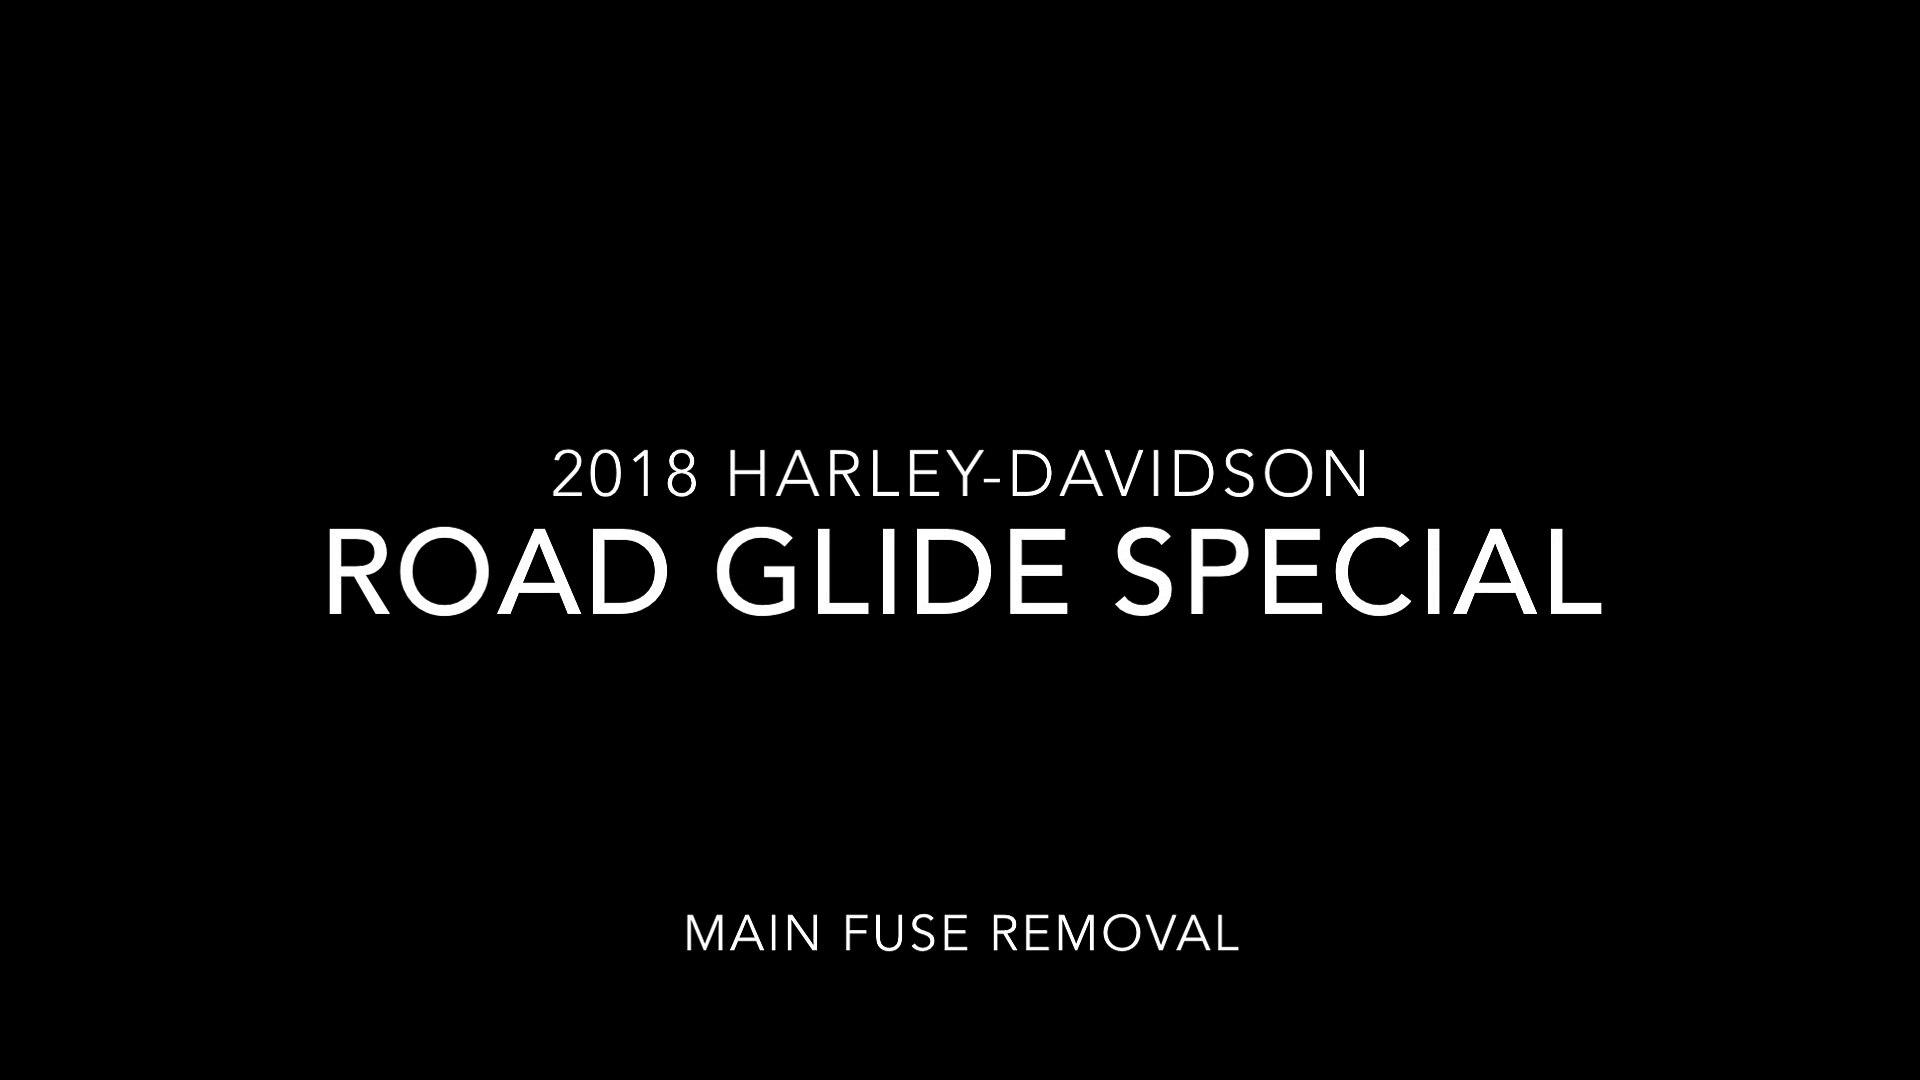 harley davidson street glide fuse box 2018 harley davidson road glide special main fuse removal video  2018 harley davidson road glide special